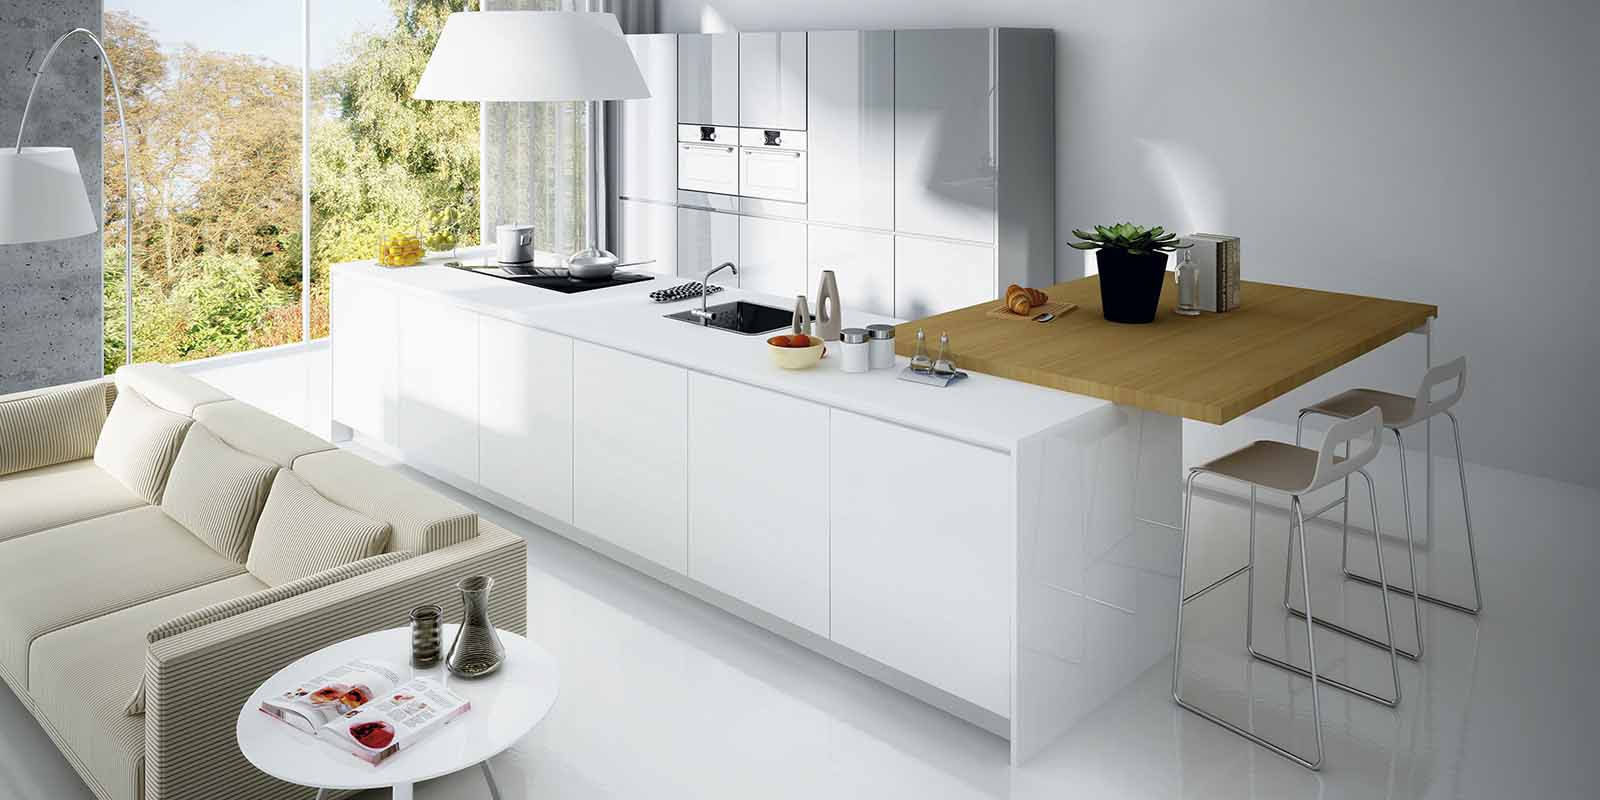 Cocina 09 cocinas capis dise o y fabricaci n de cocinas for Configurador de cocinas